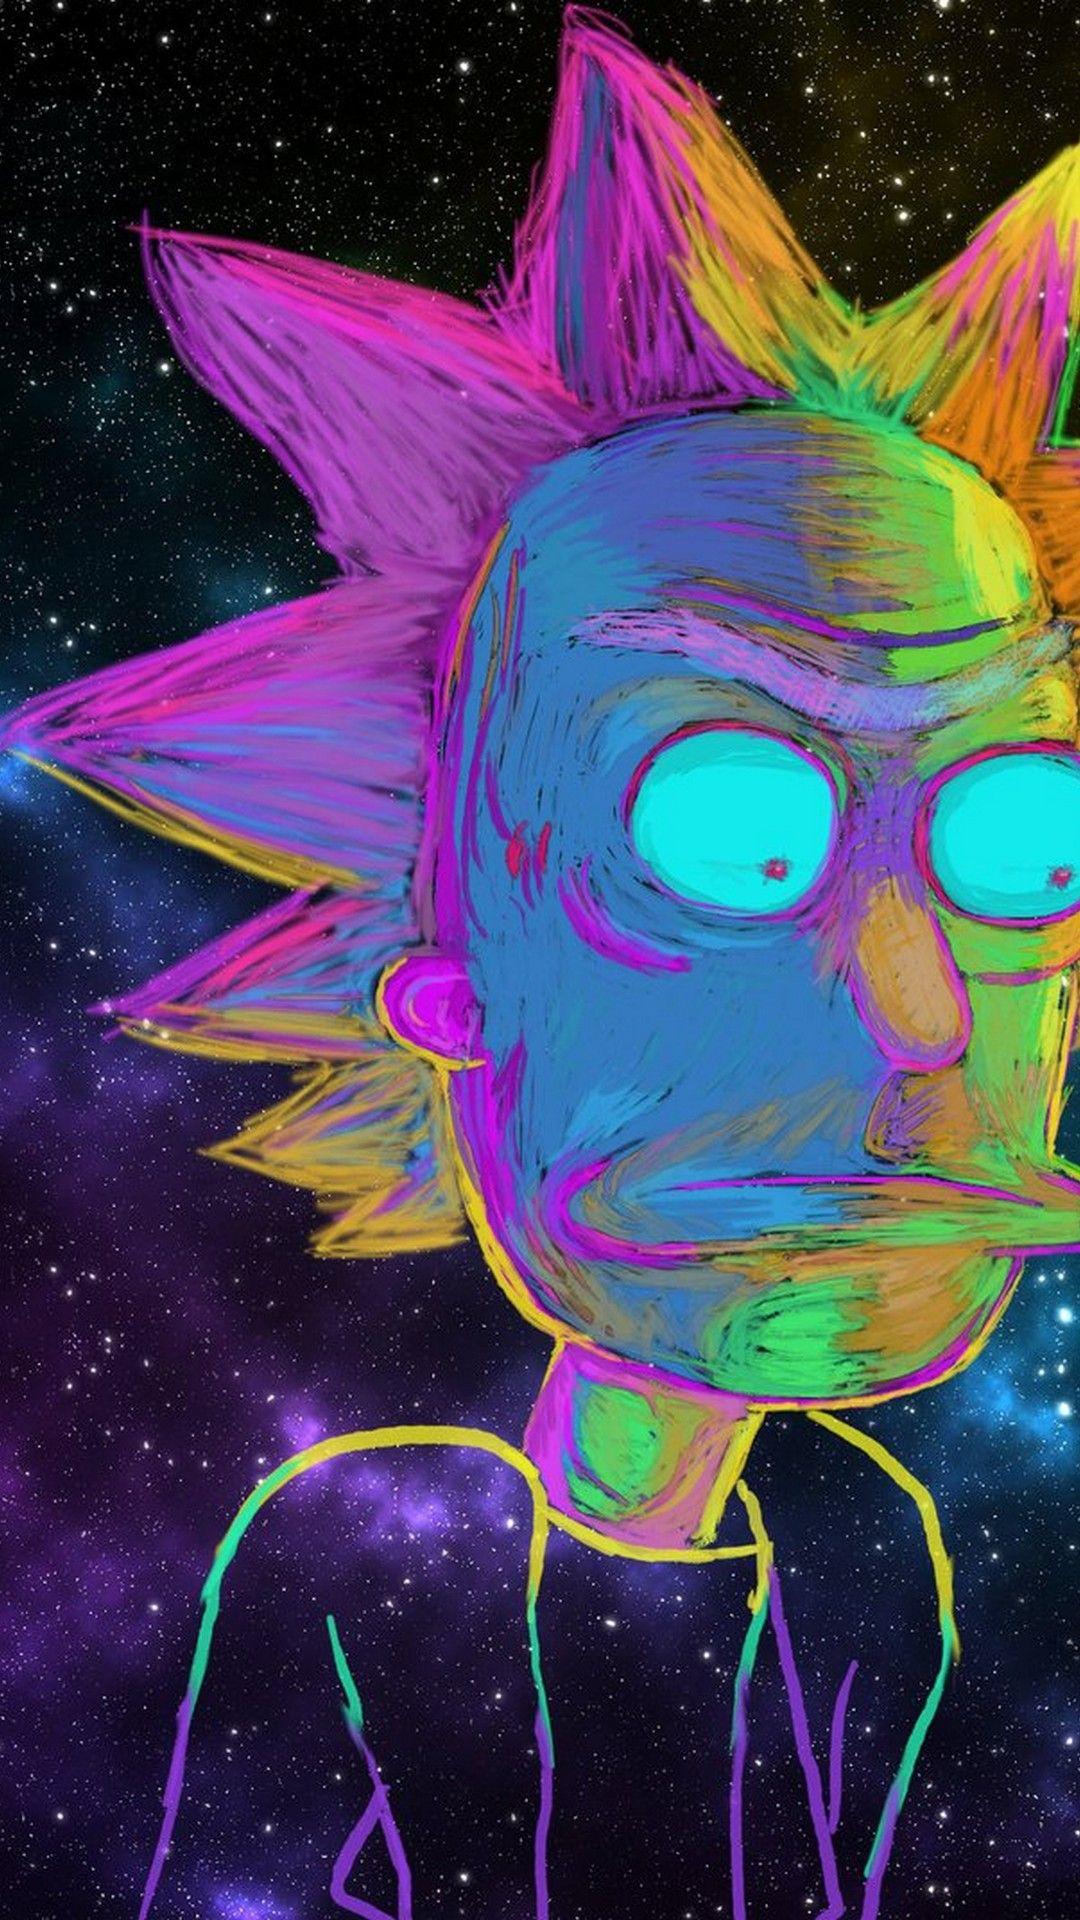 Hd Wallpaper Rick And Morty Cartoon Iphone Cartoon Wallpaper Rick And Morty Poster Cartoon Wallpaper Hd